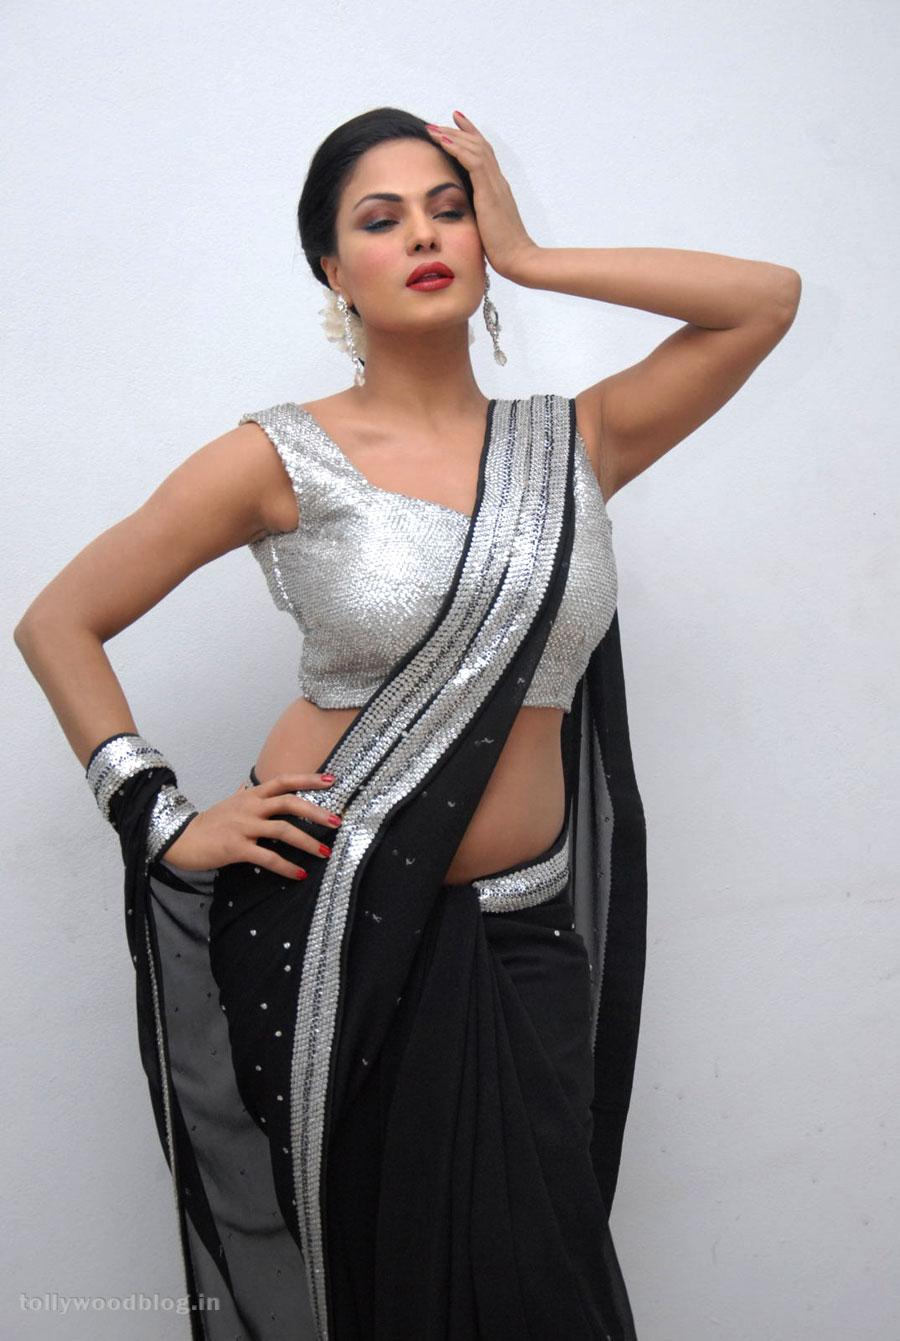 Veena malik new hot remarkable